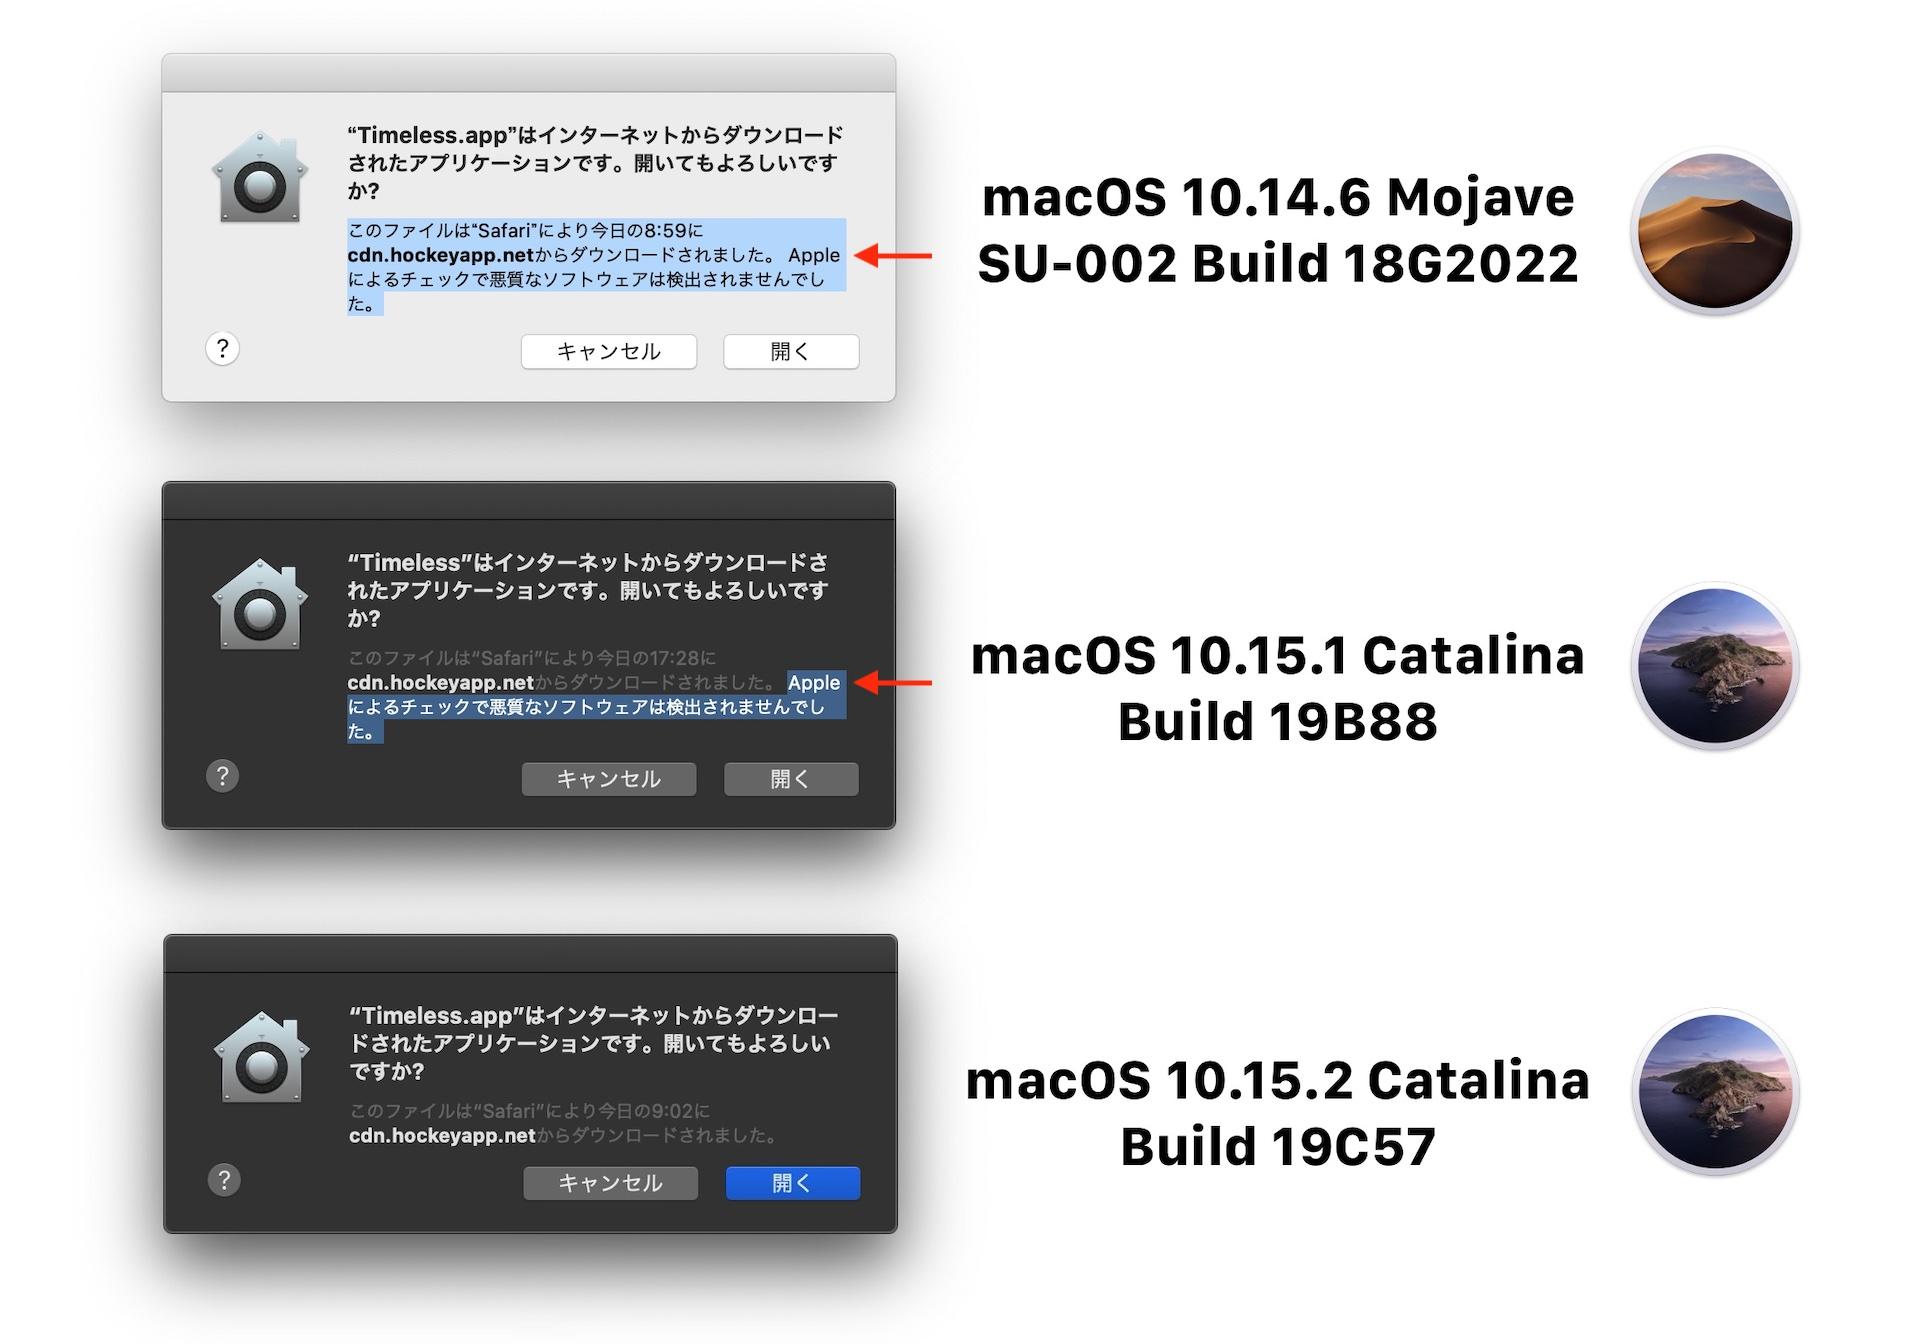 macOS 10.15.2 CatalinaのGatekeeper警告2